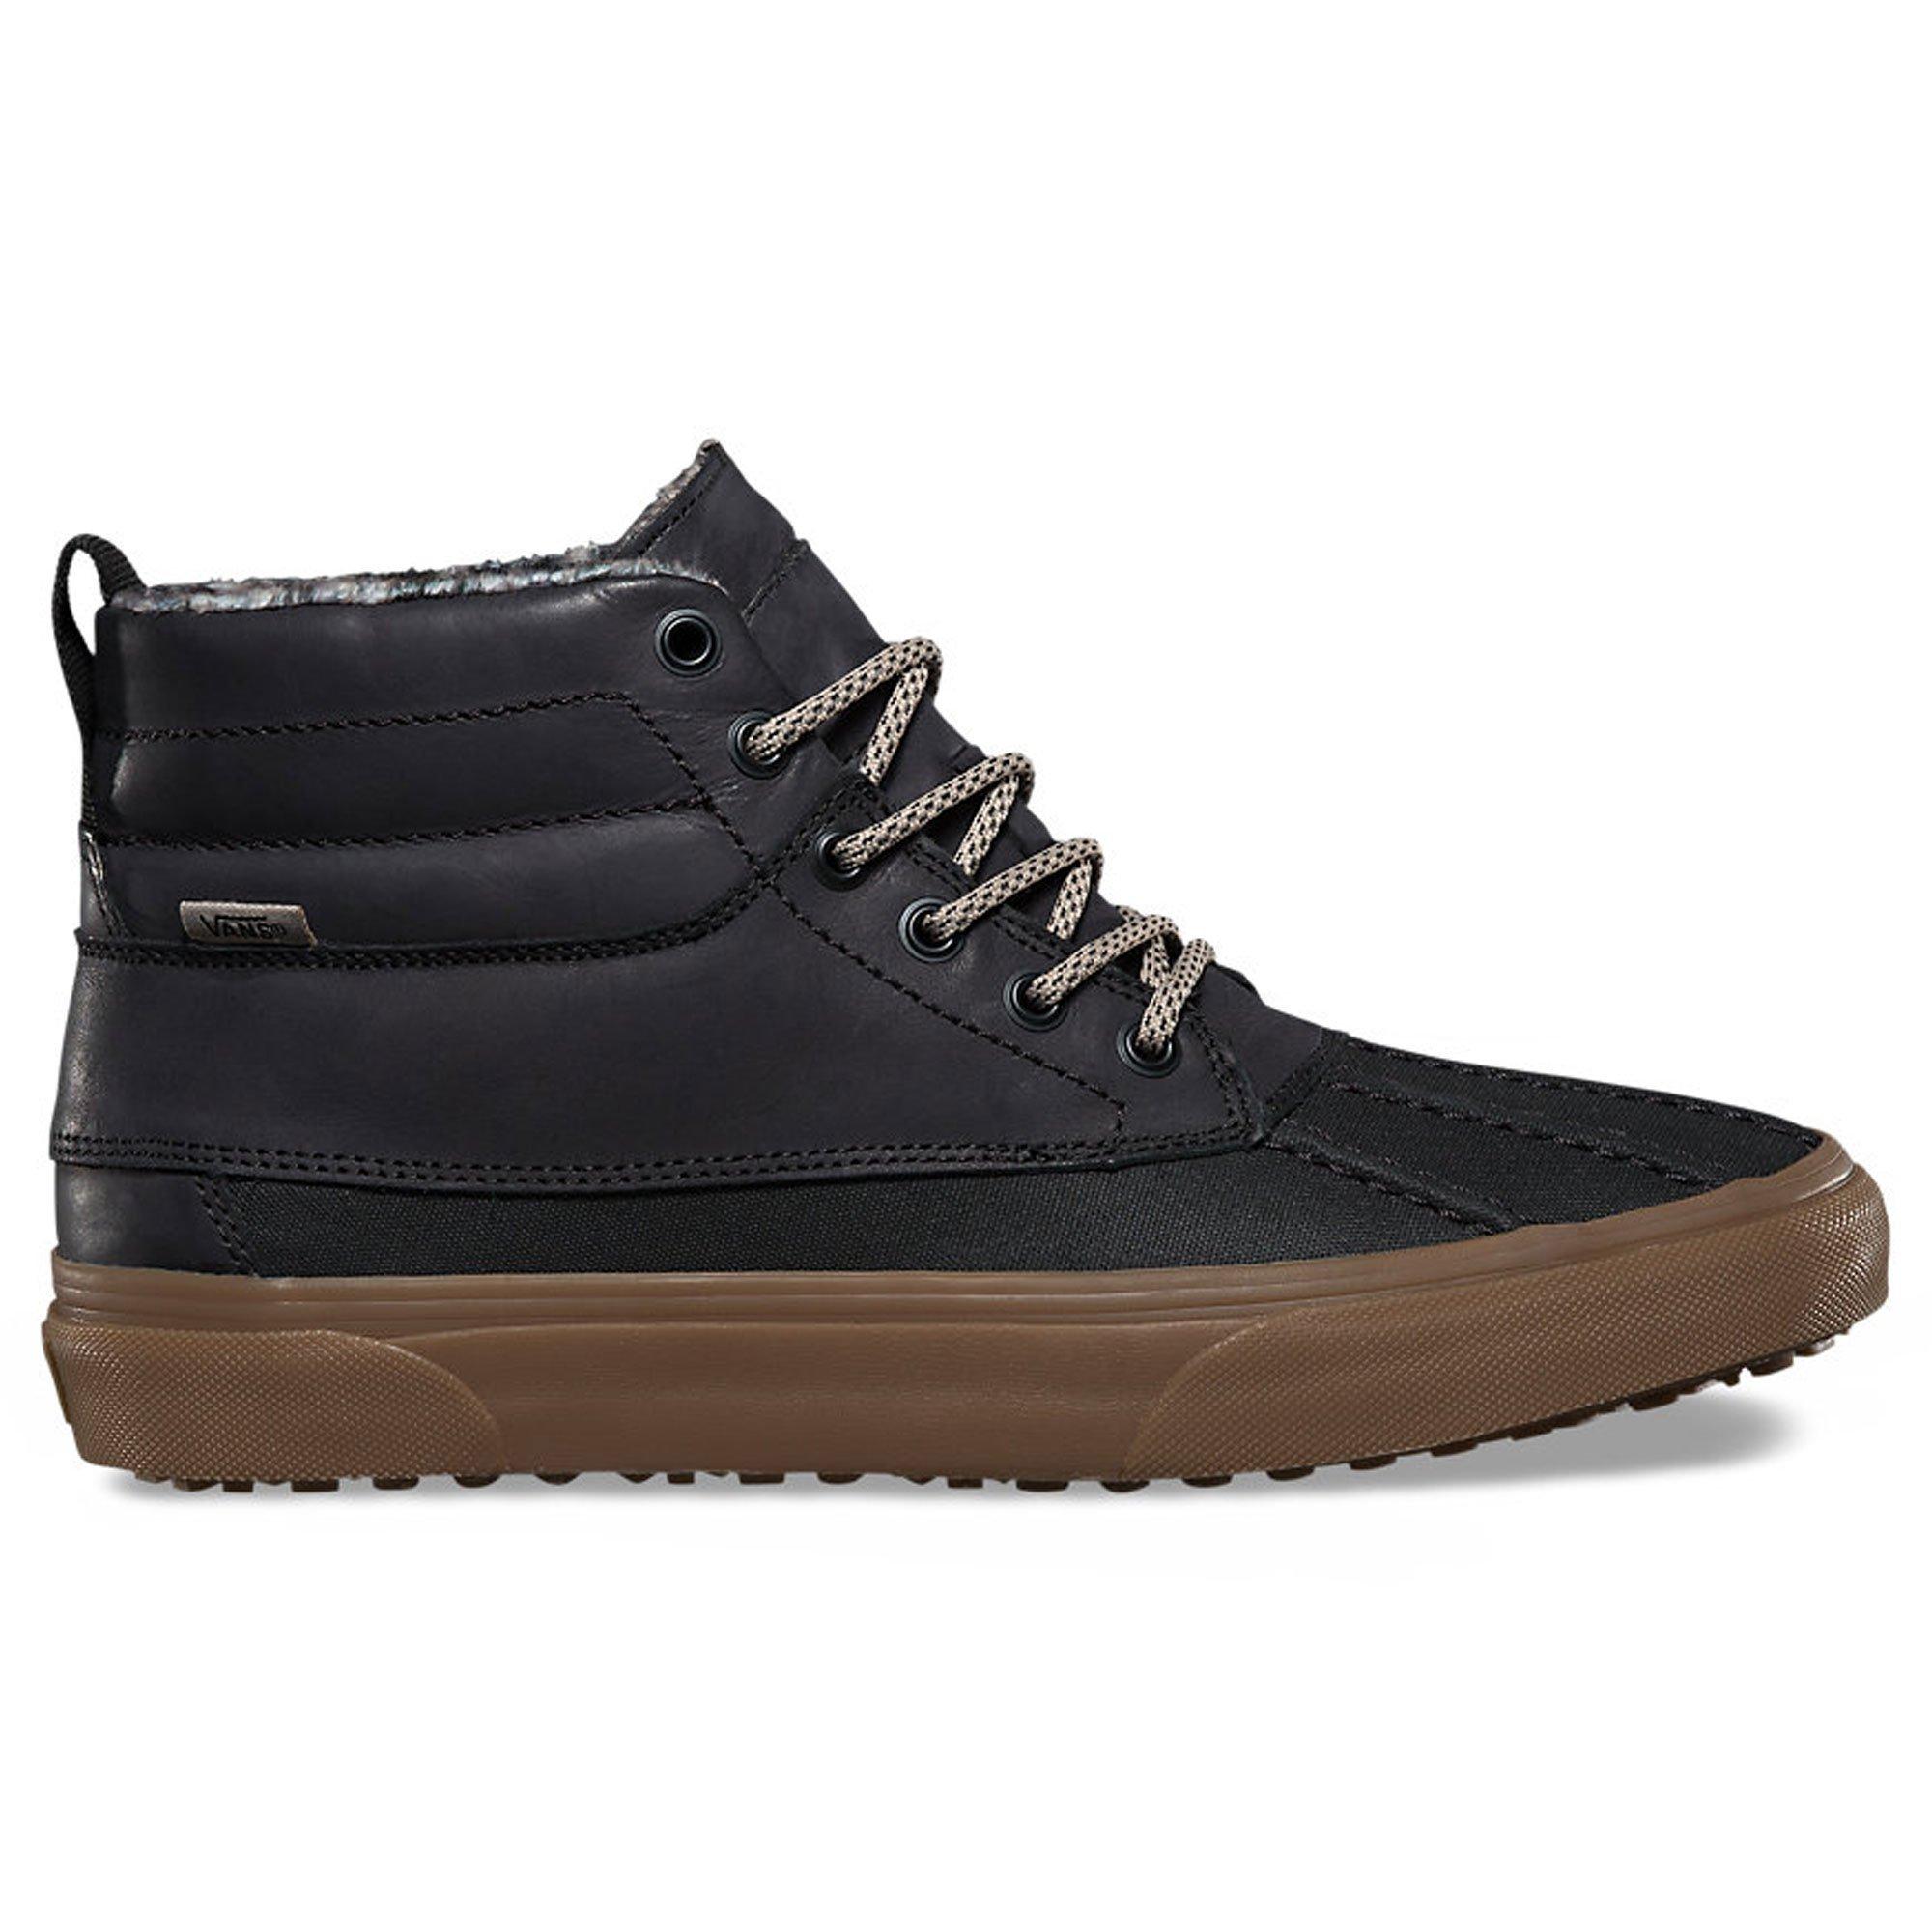 de162e9f3e9 Galleon - Vans Mens SK8-HI Del Pato MTE Sneaker Black Feather Gum Size 10